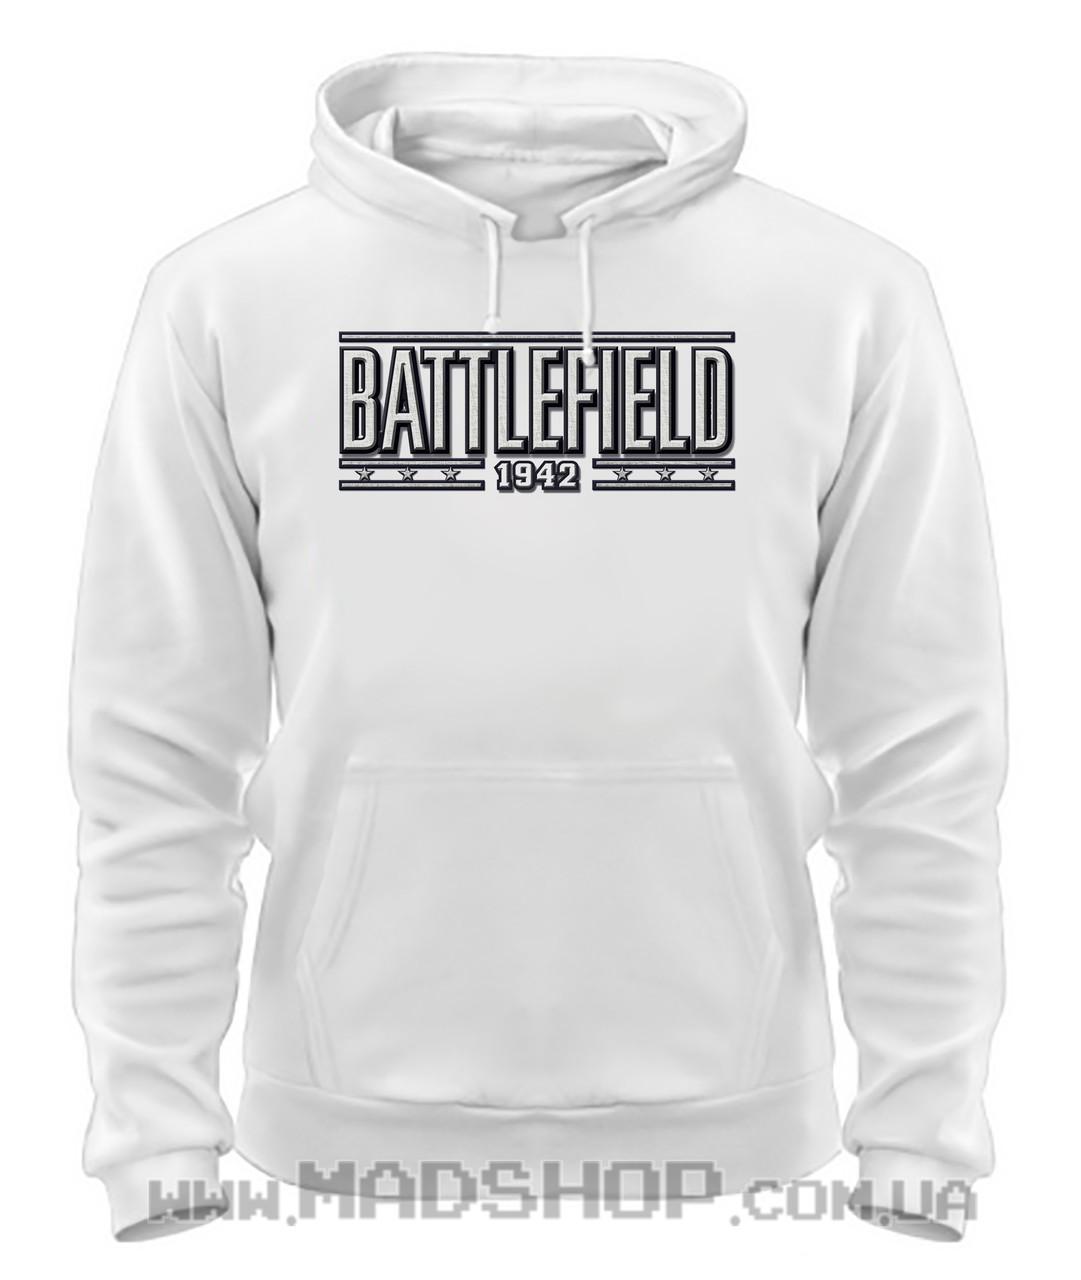 Толстовка Бателфилд Battlefield 1942